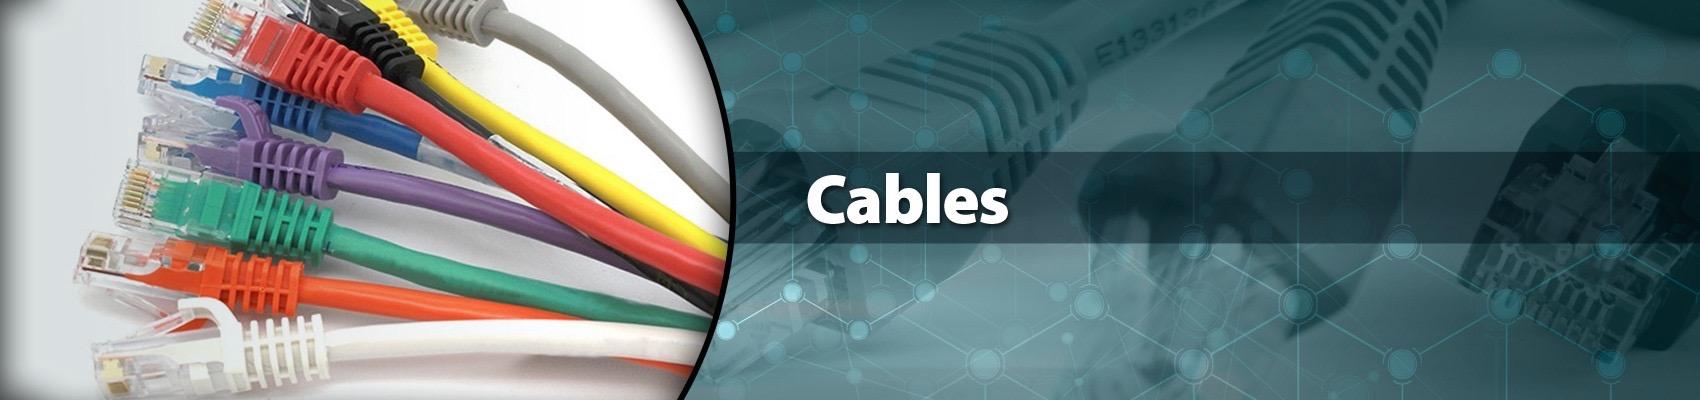 Network Craze Cables